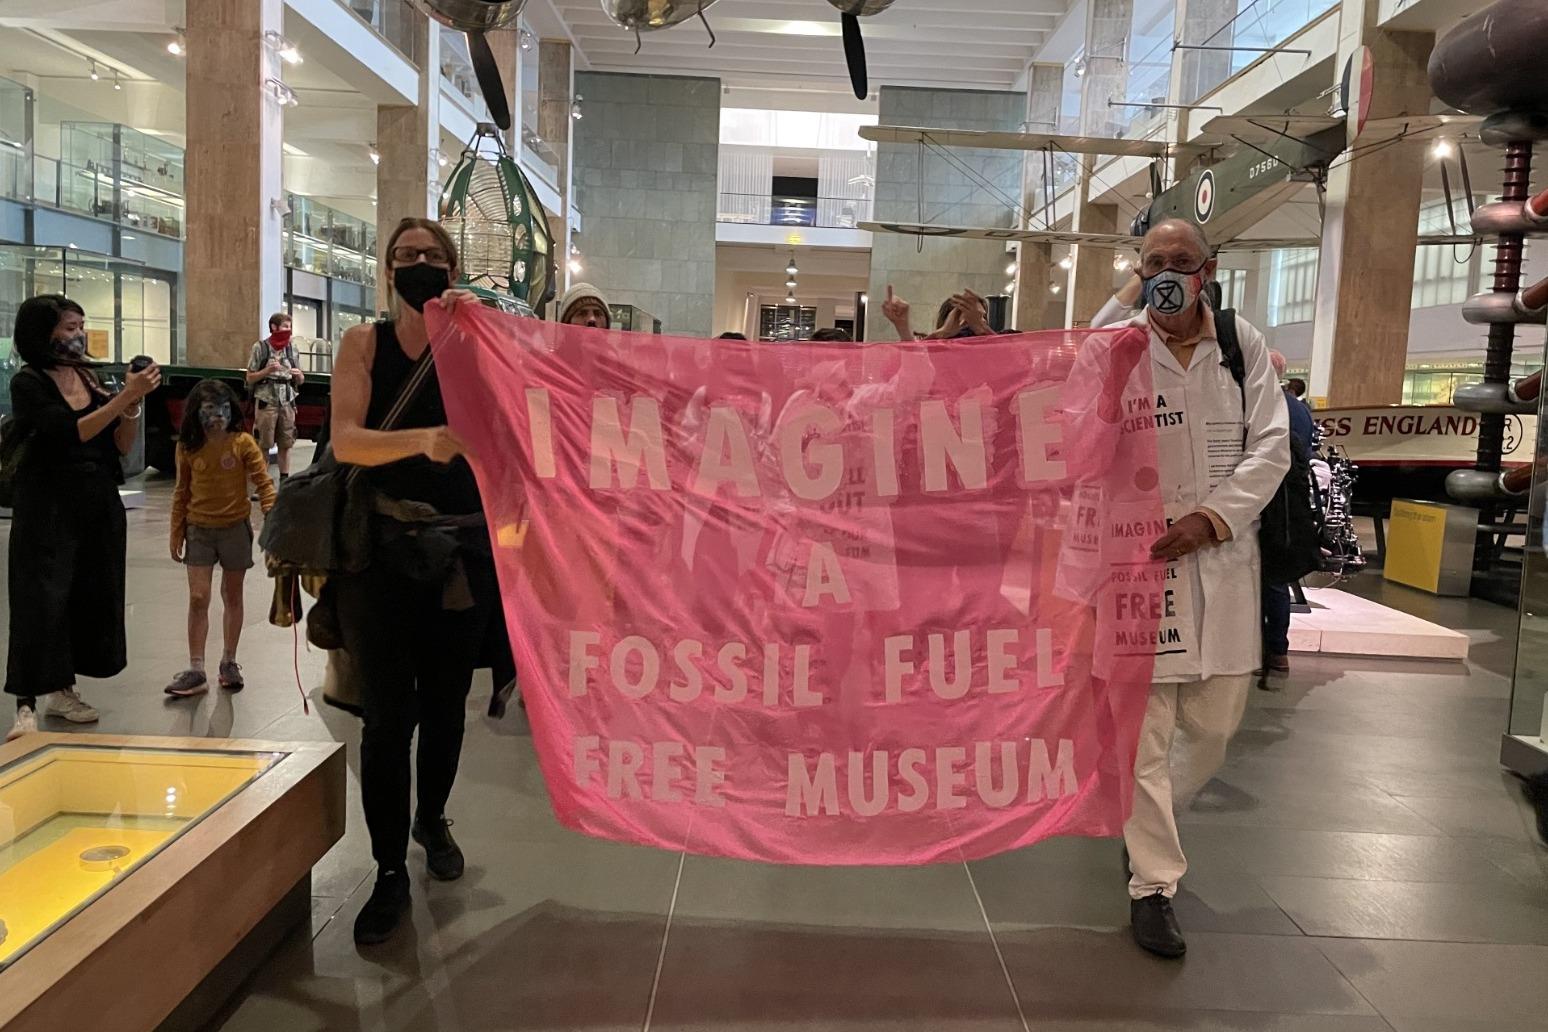 Science Museum board member resigns over oil sponsorship